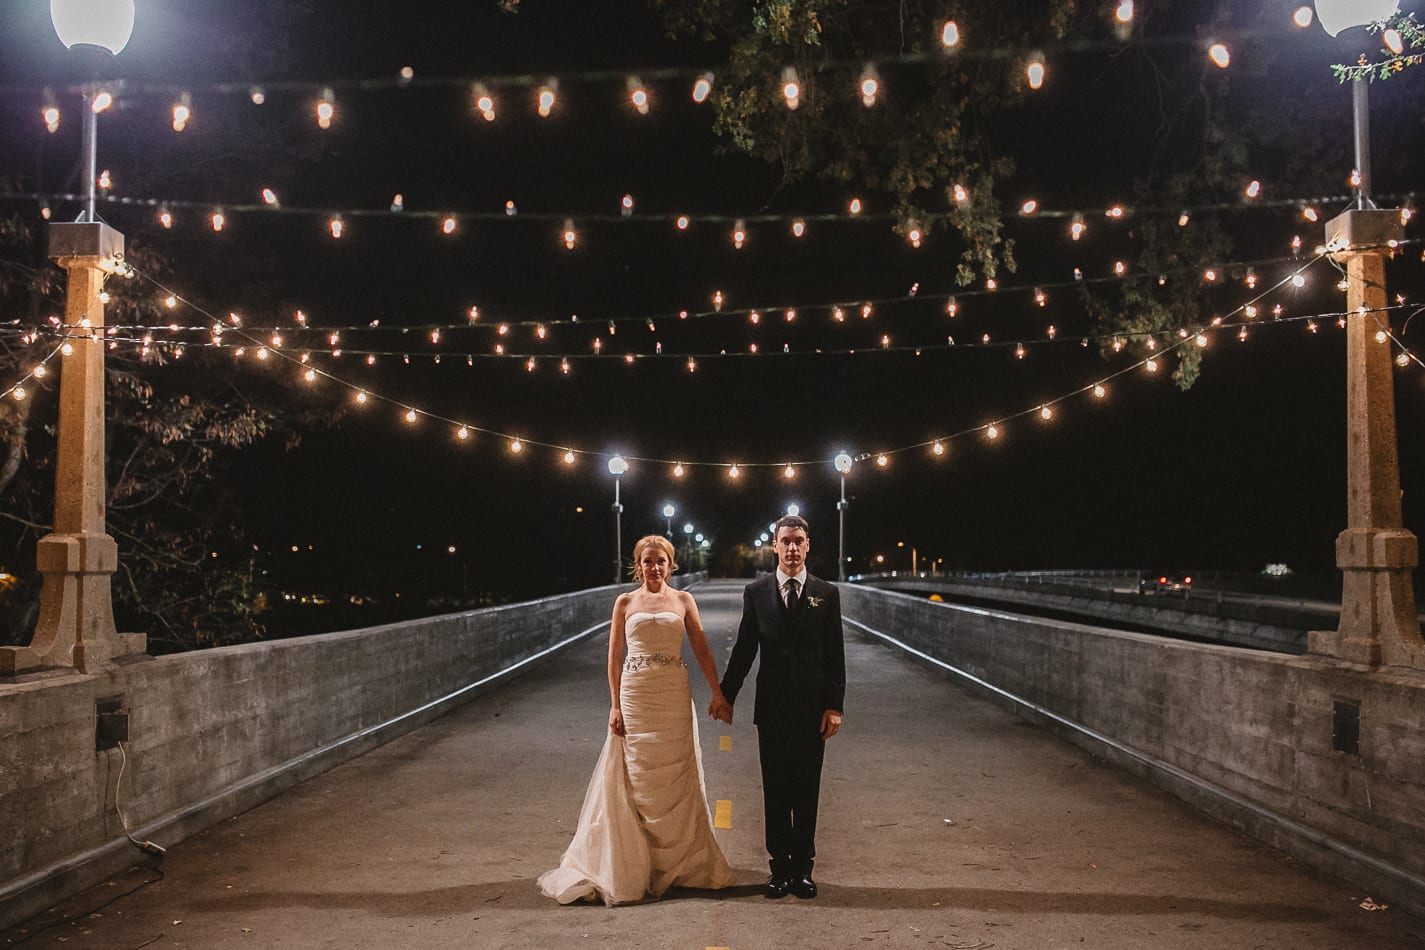 lake-redding-park-diesel-horse-bridge-view202-california-wedding-photographer-26